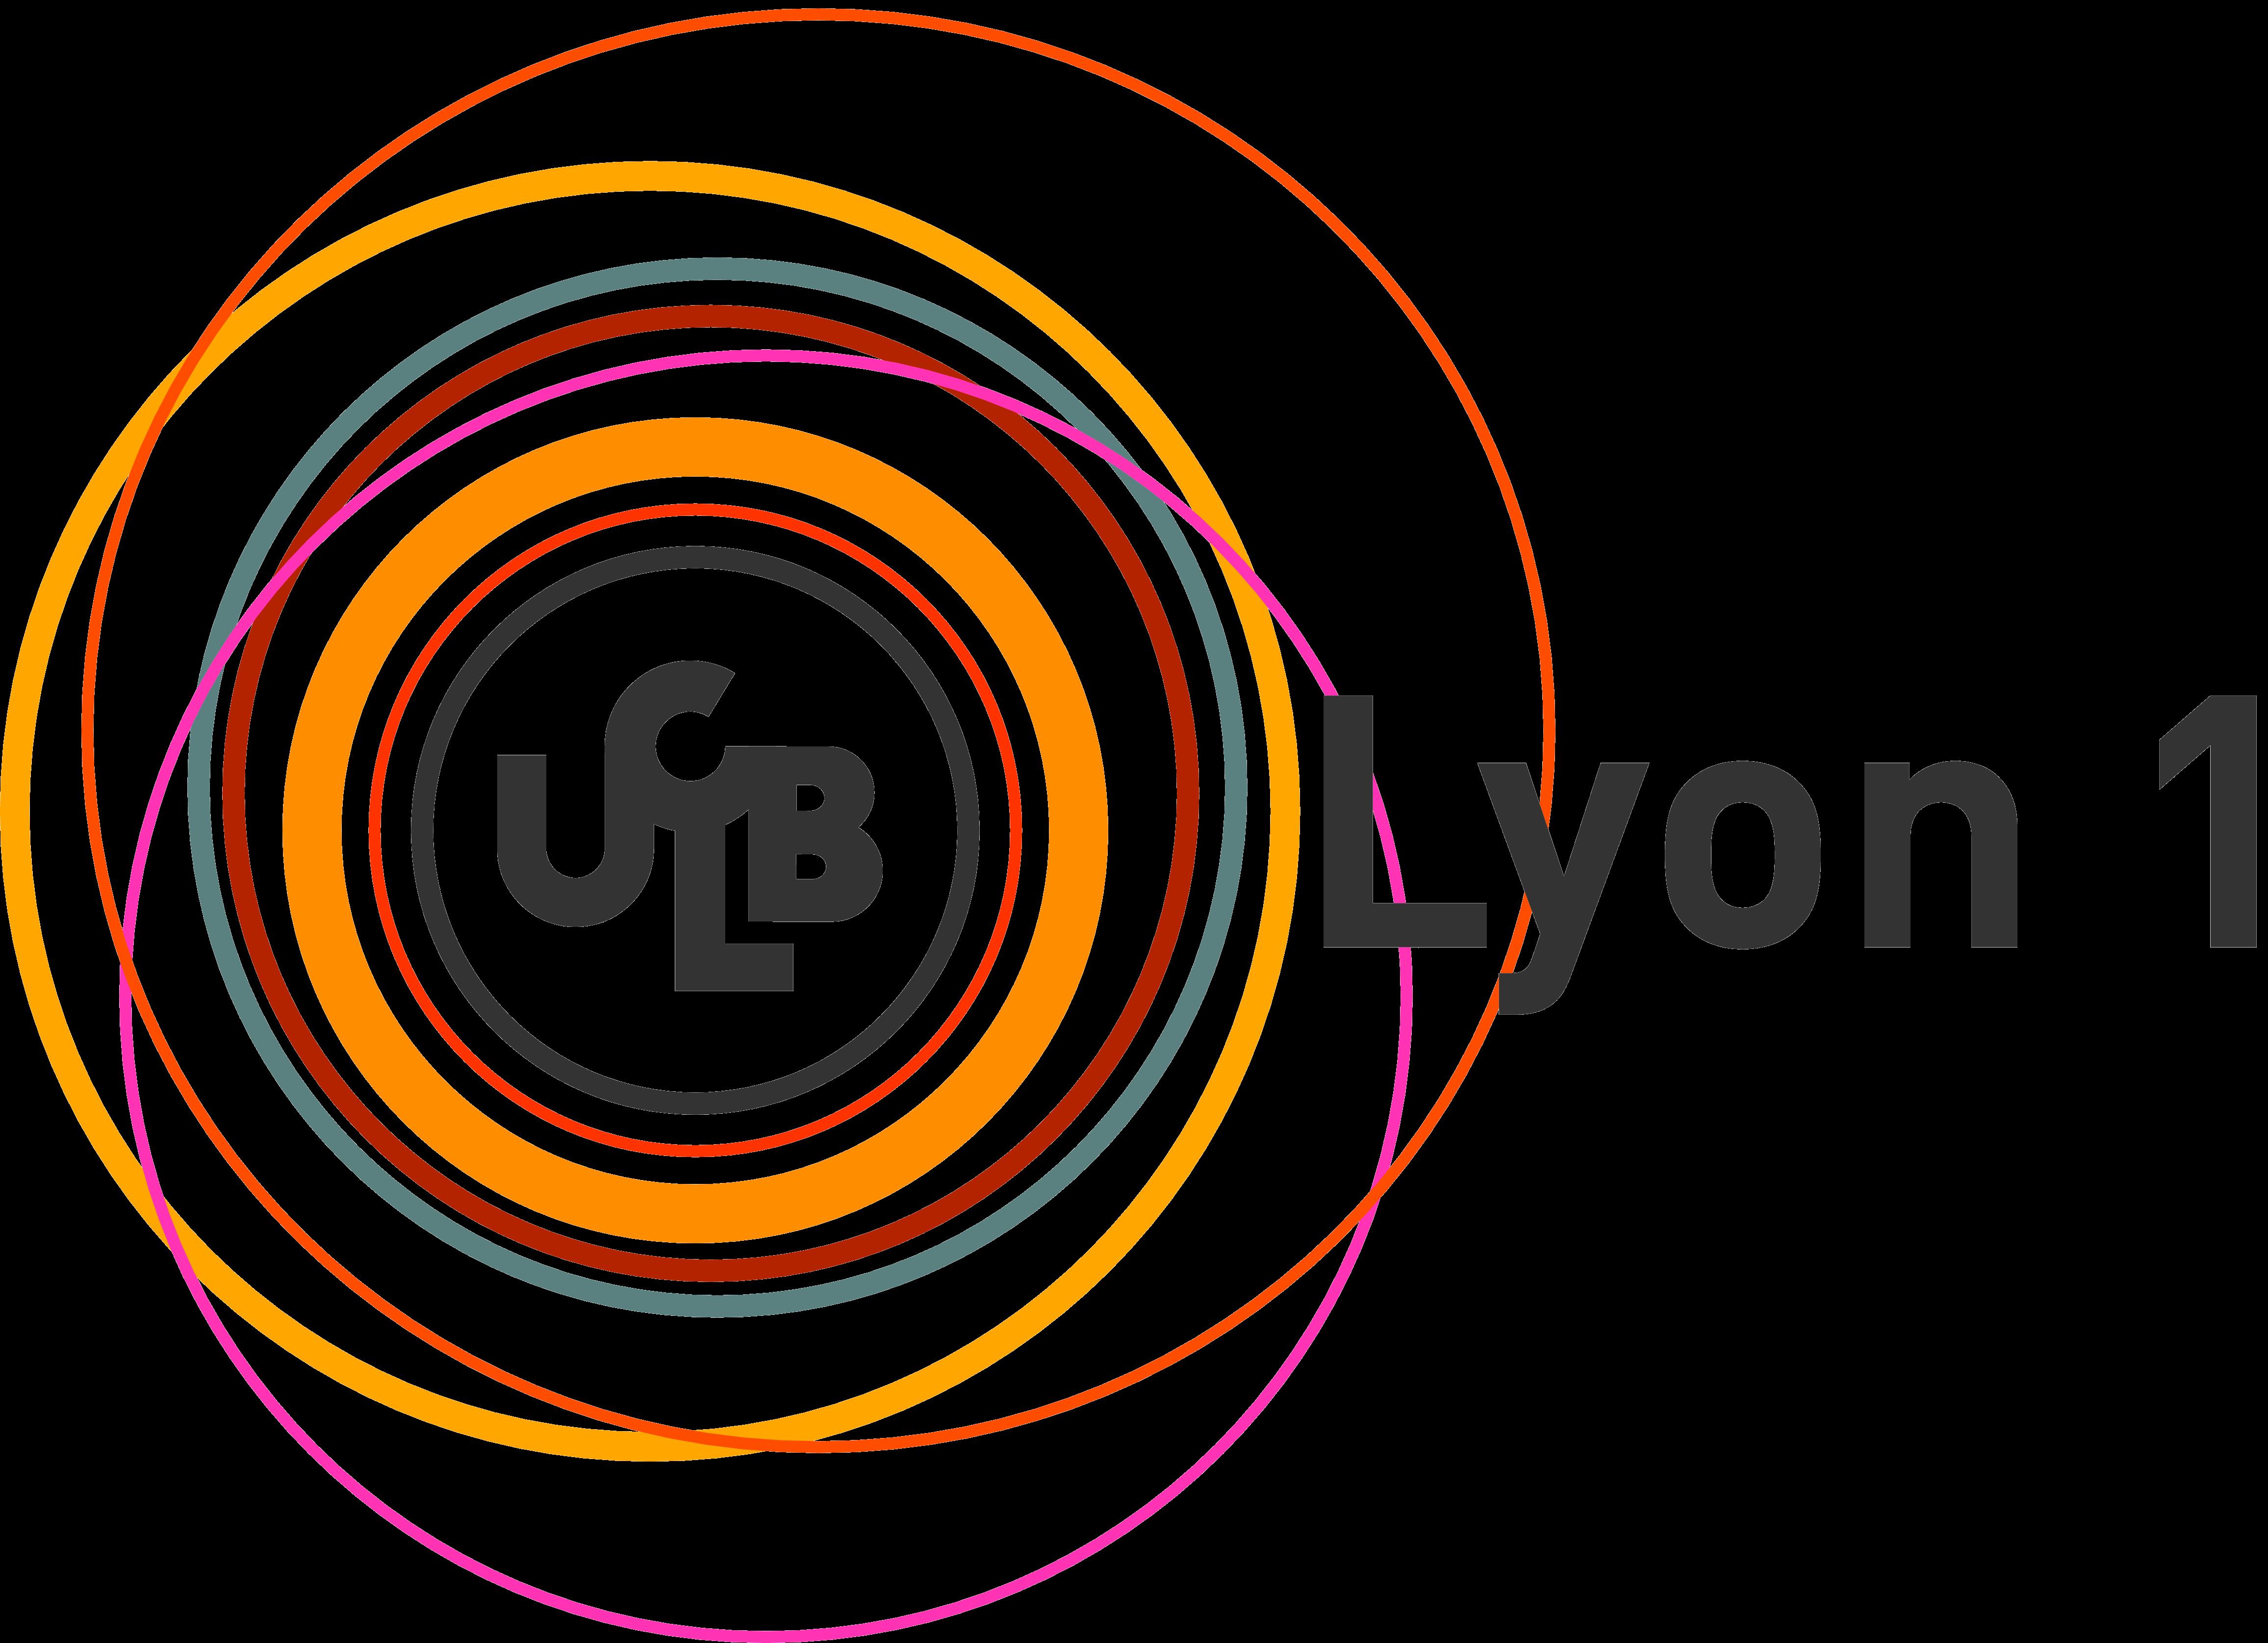 UCBL logo